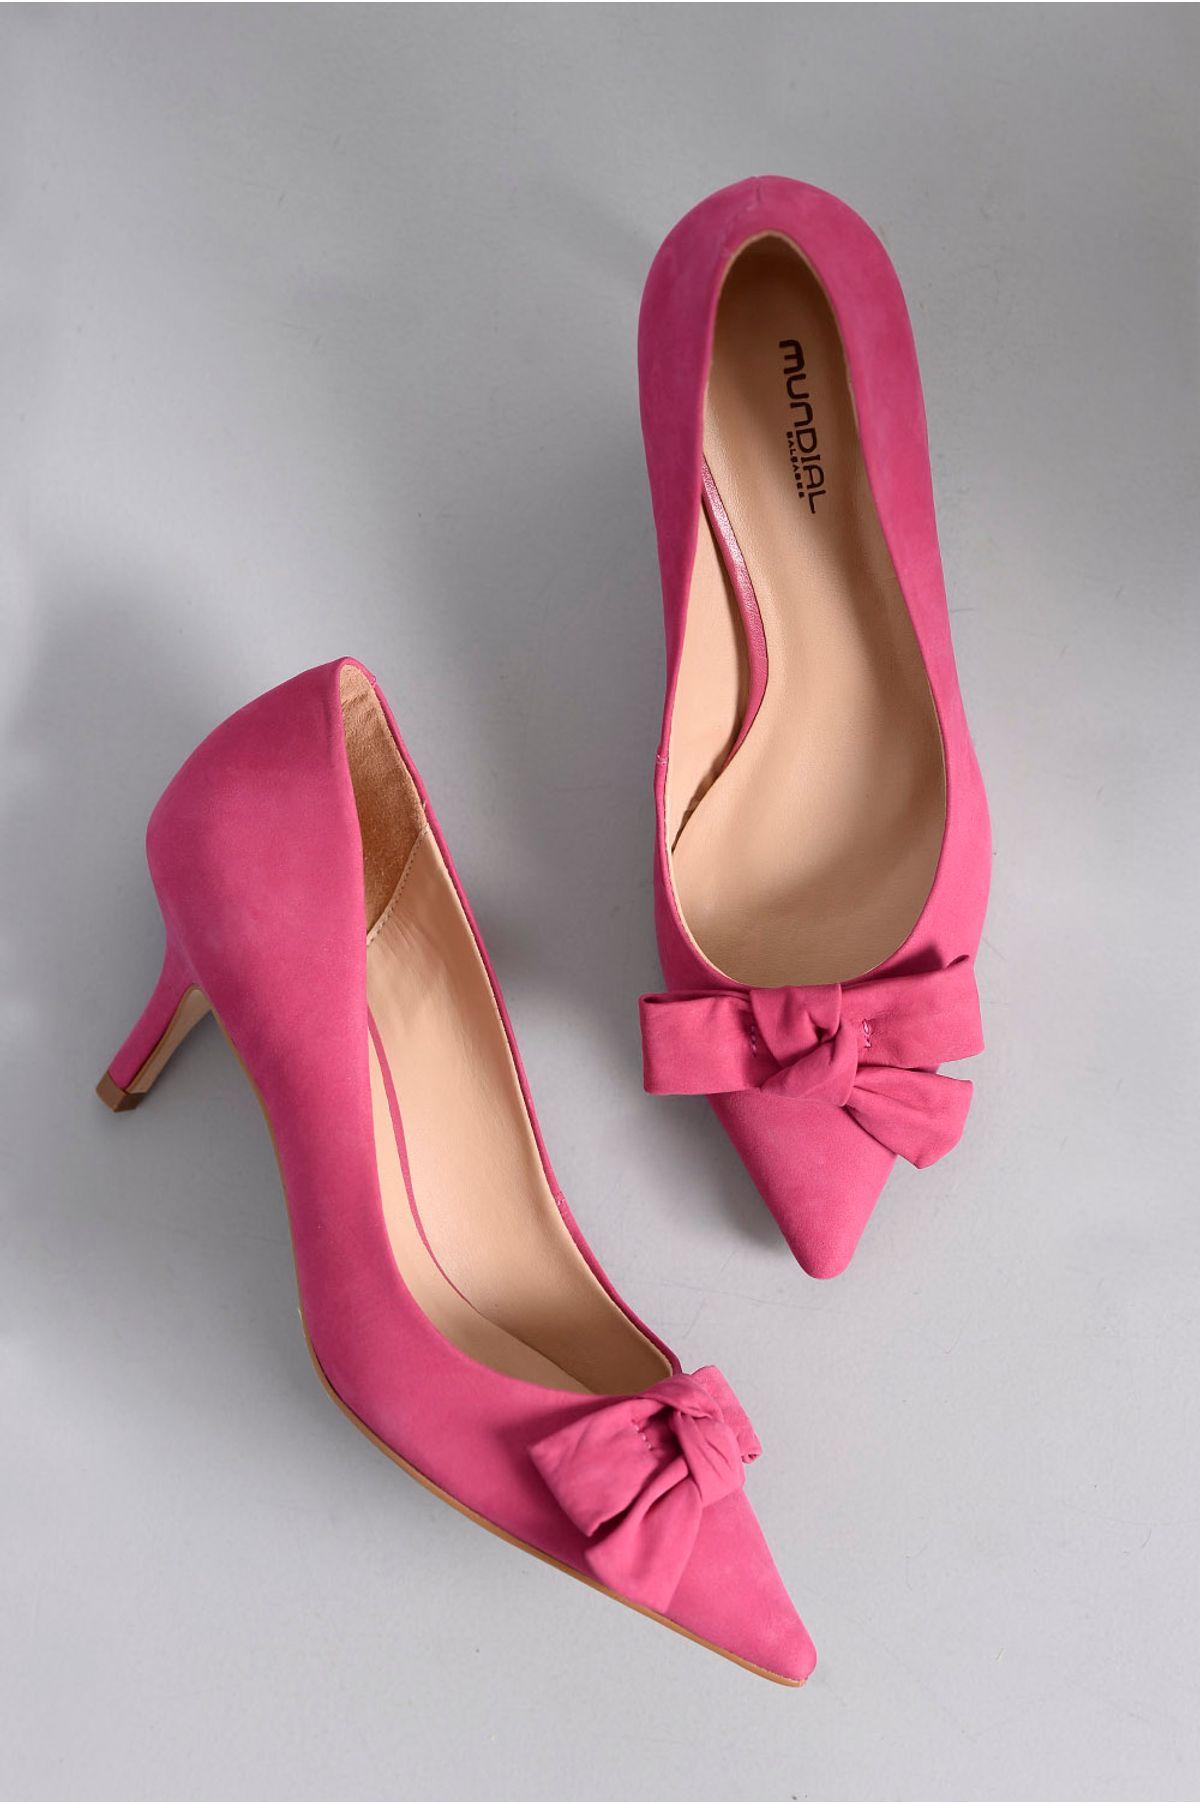 c124496a73 Scarpin Feminino Salto Médio Edith Mundial NB - PINK - Mundial Calçados